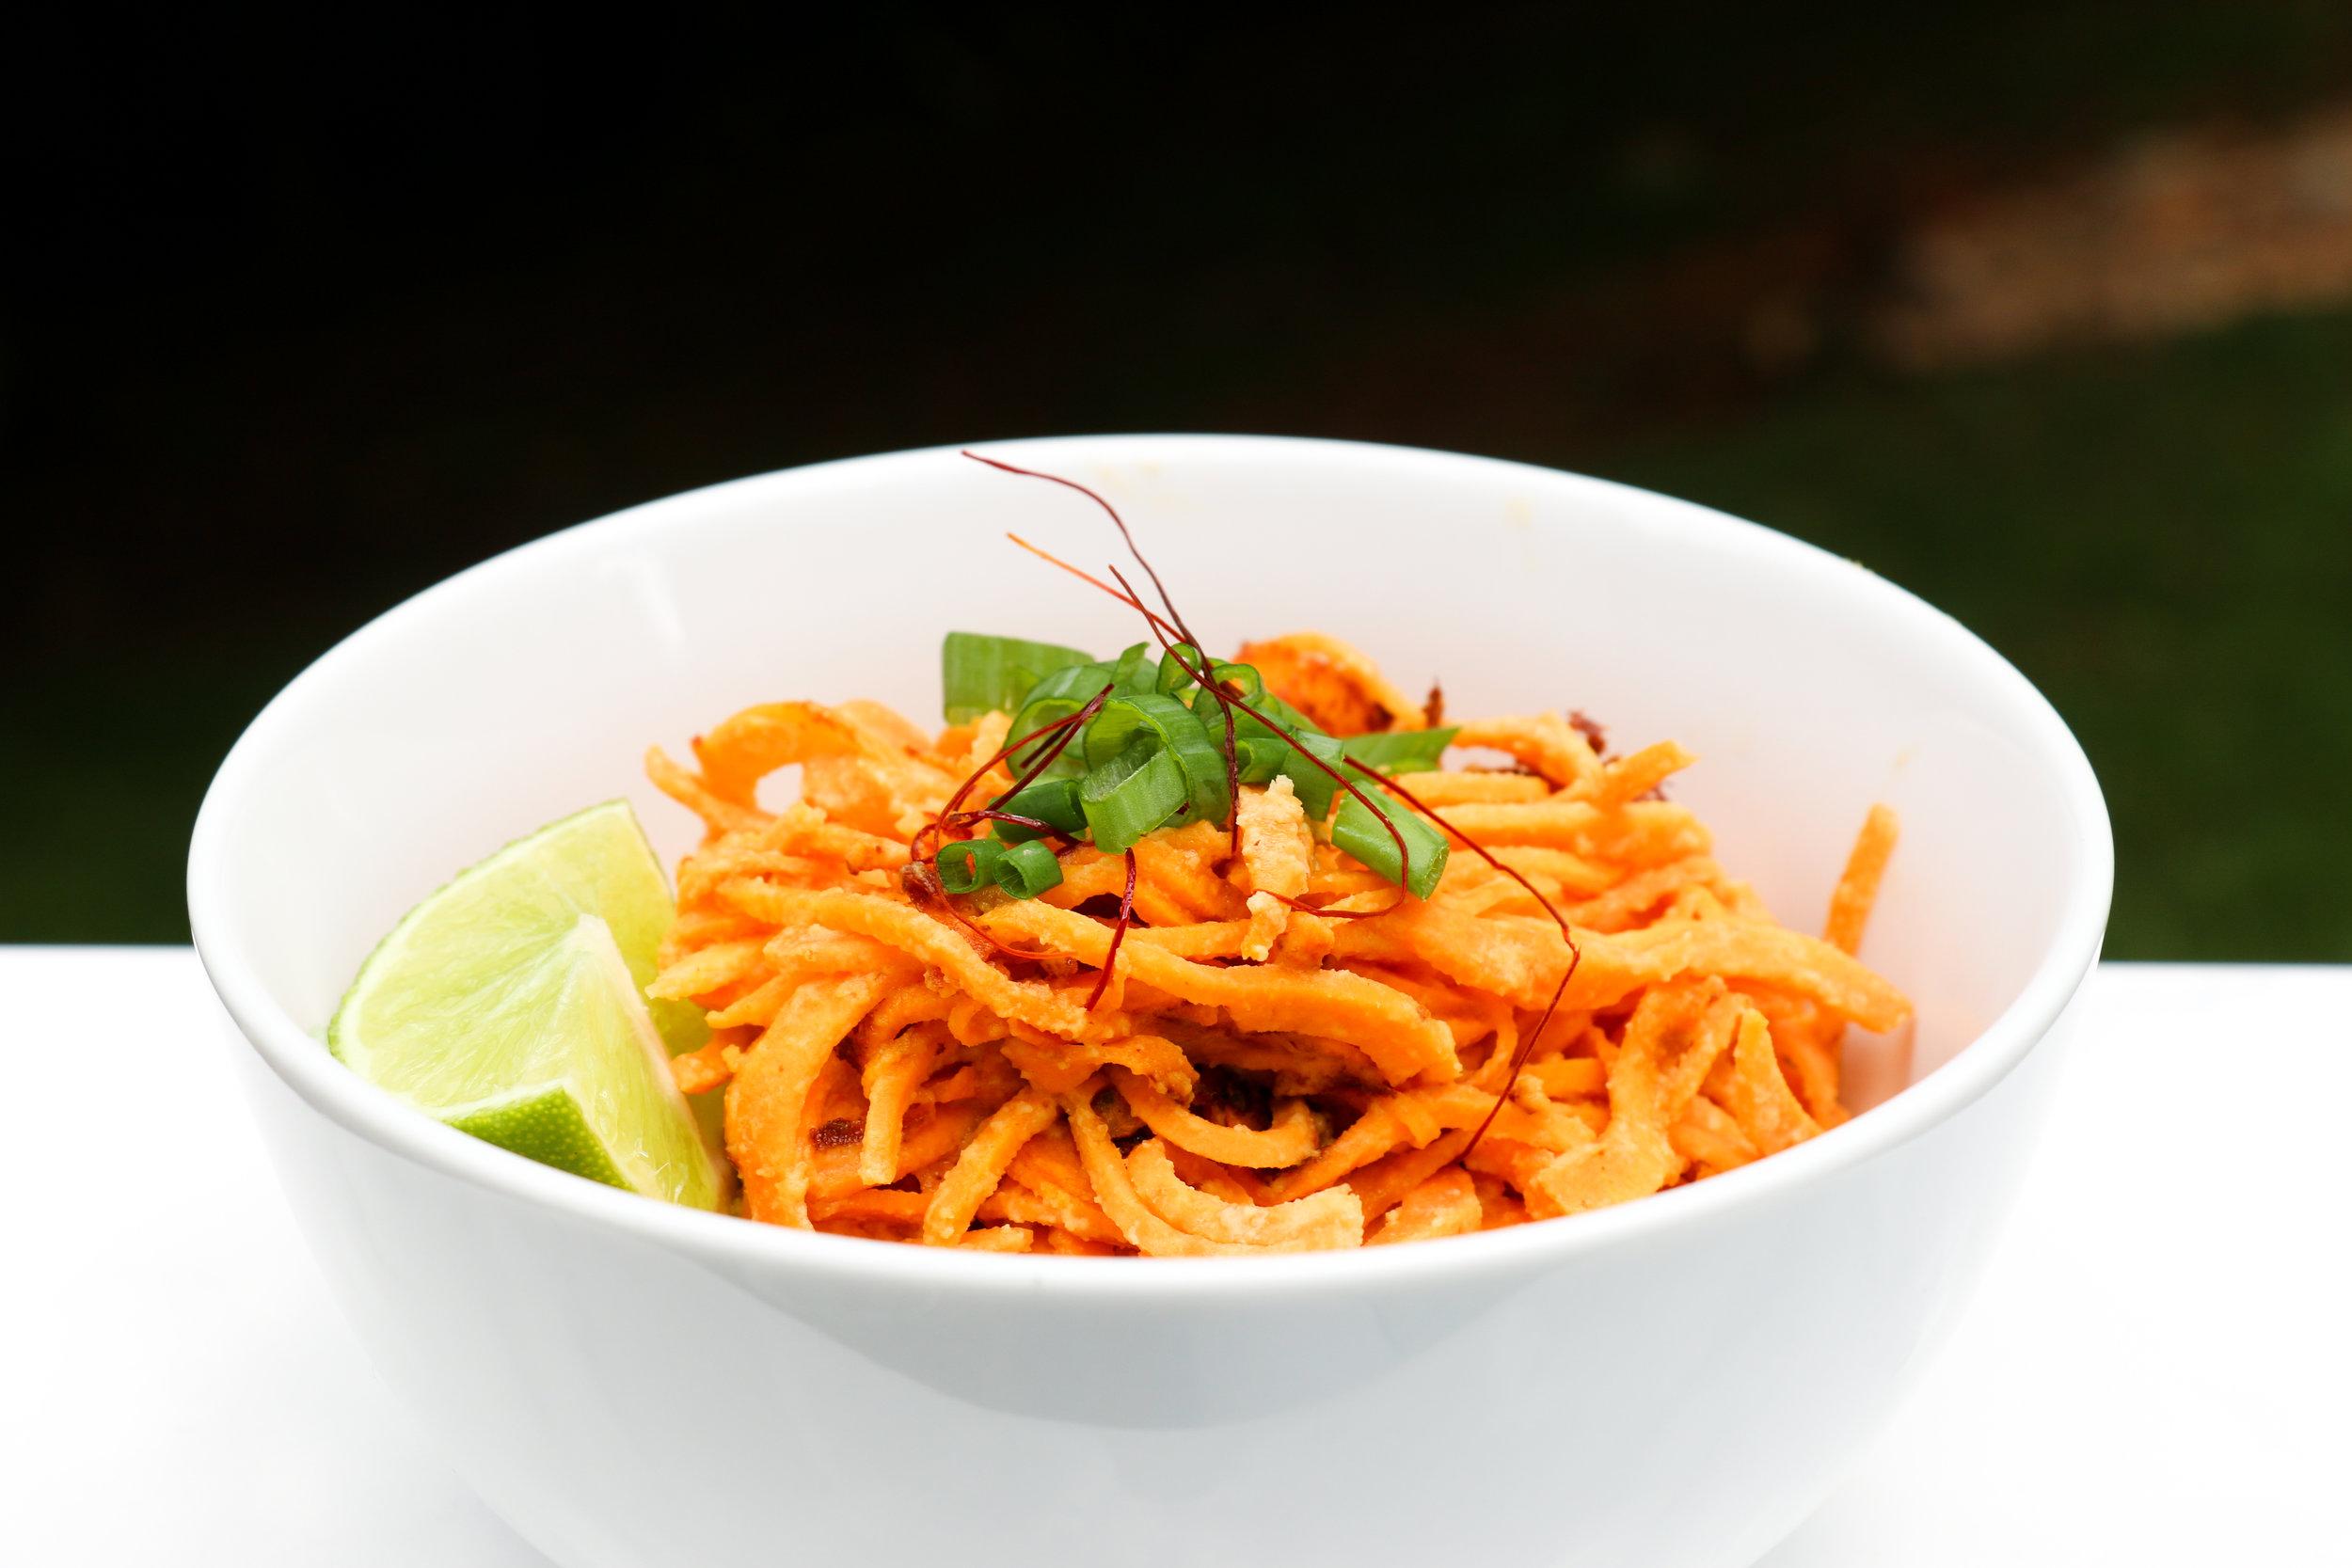 big-10-paleo-spiralizer-cookbook-megan-flynn-peterson-thai-almond-sweet-potato-noodle-bowl